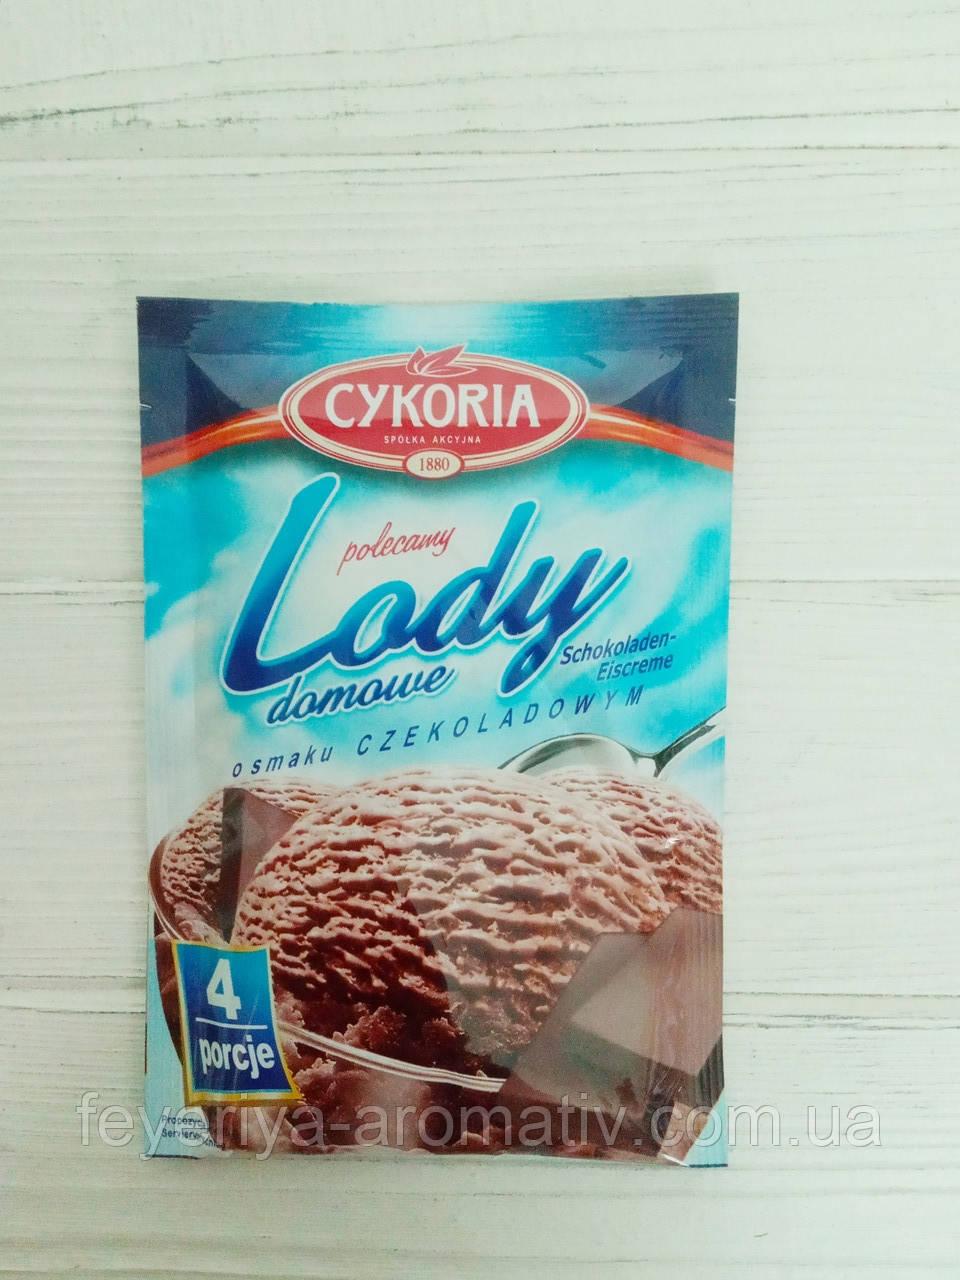 Cykoria Lody домашнее сухое мороженое шоколад 60 г.